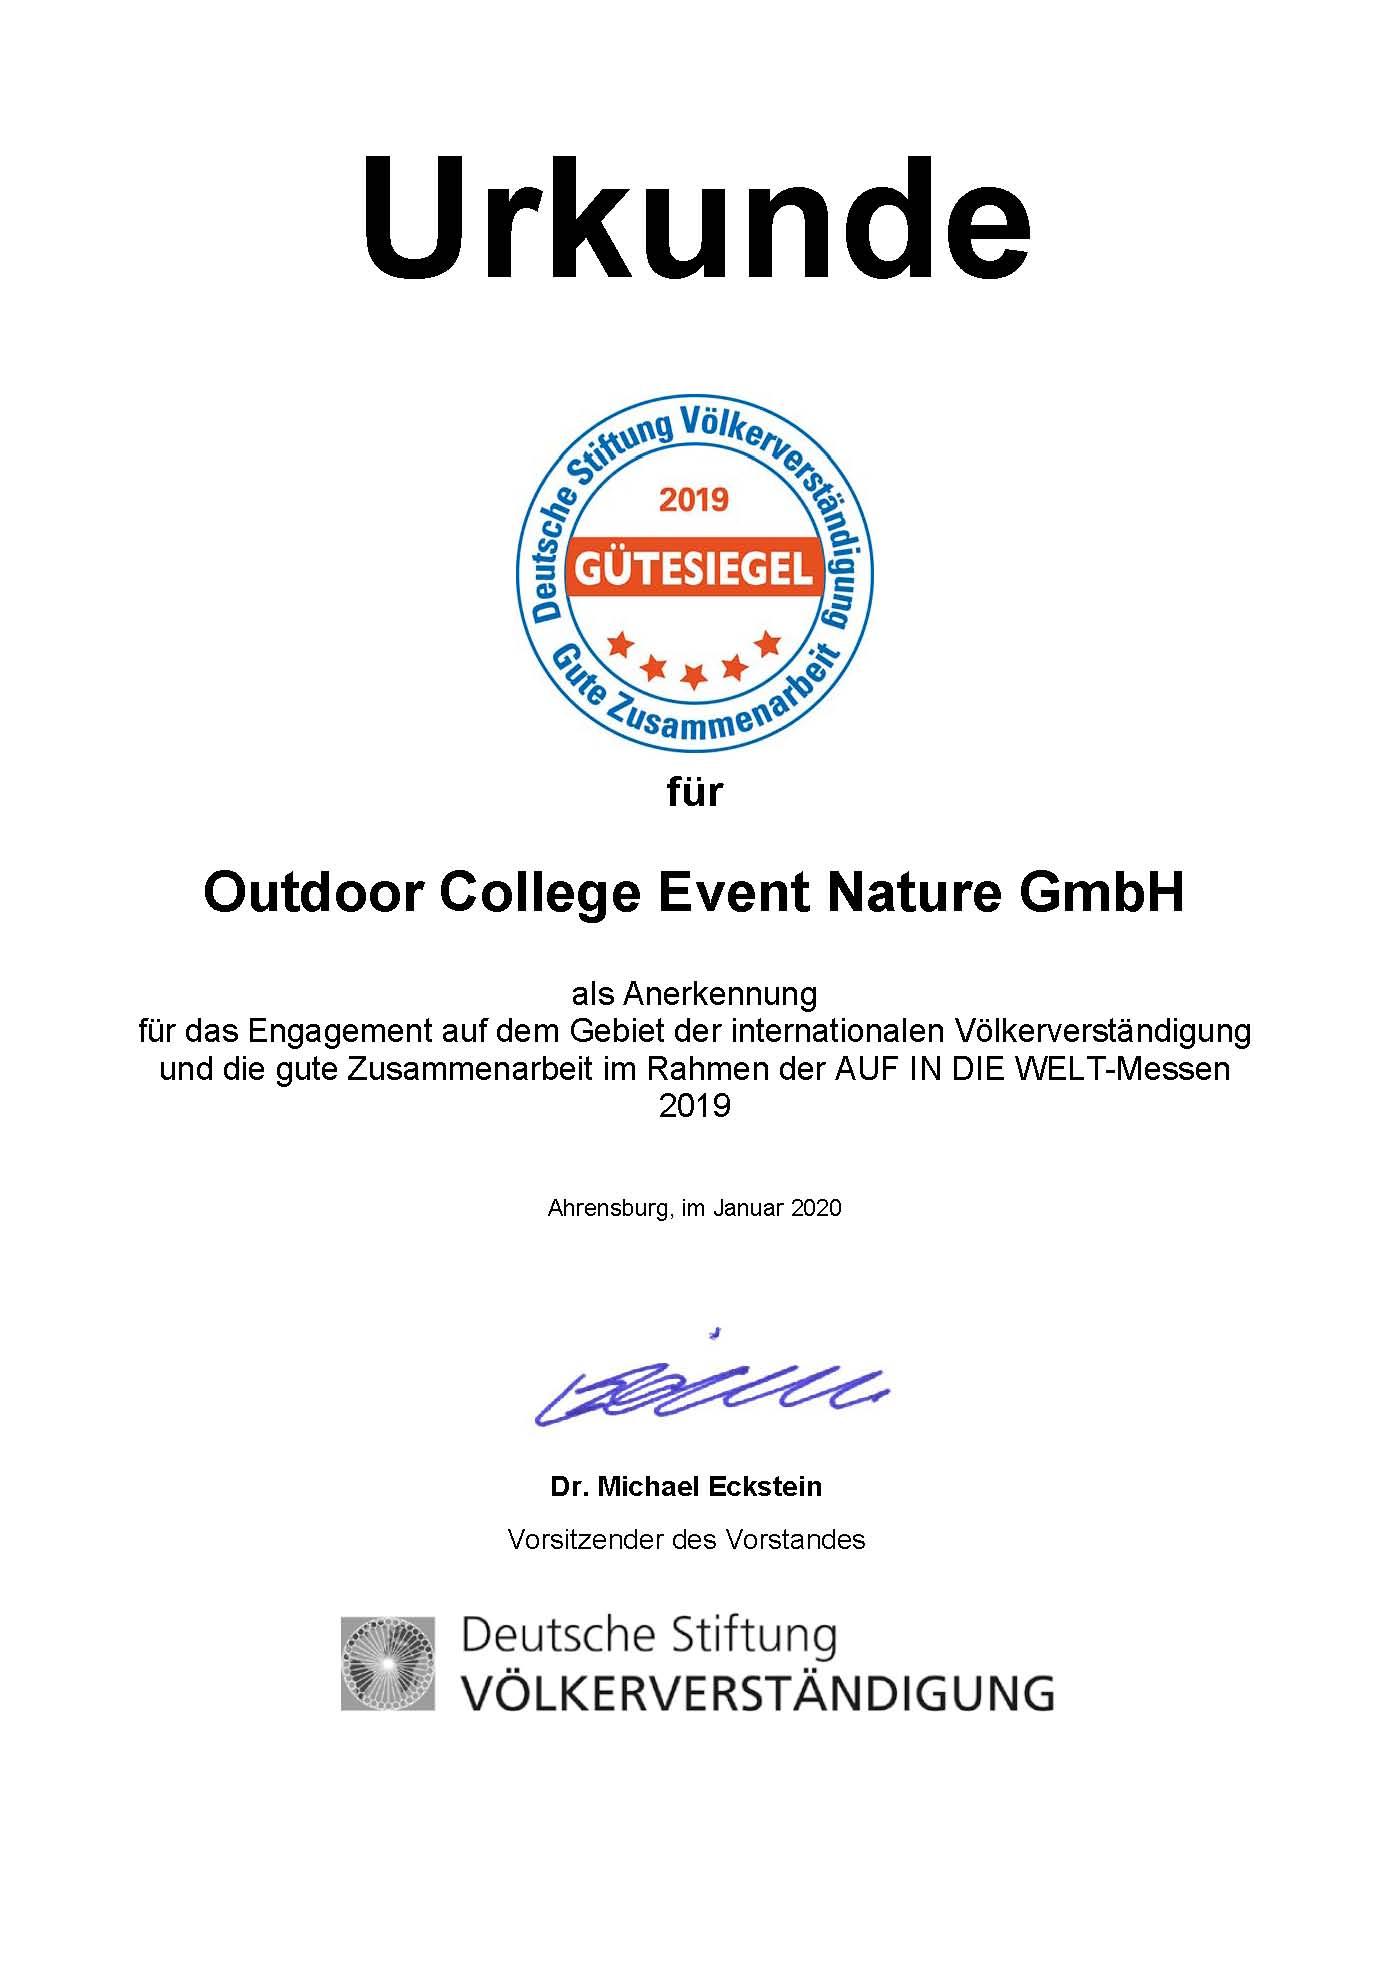 2020.02.03 Gütesiegel 2019 Urkunde Outdoor